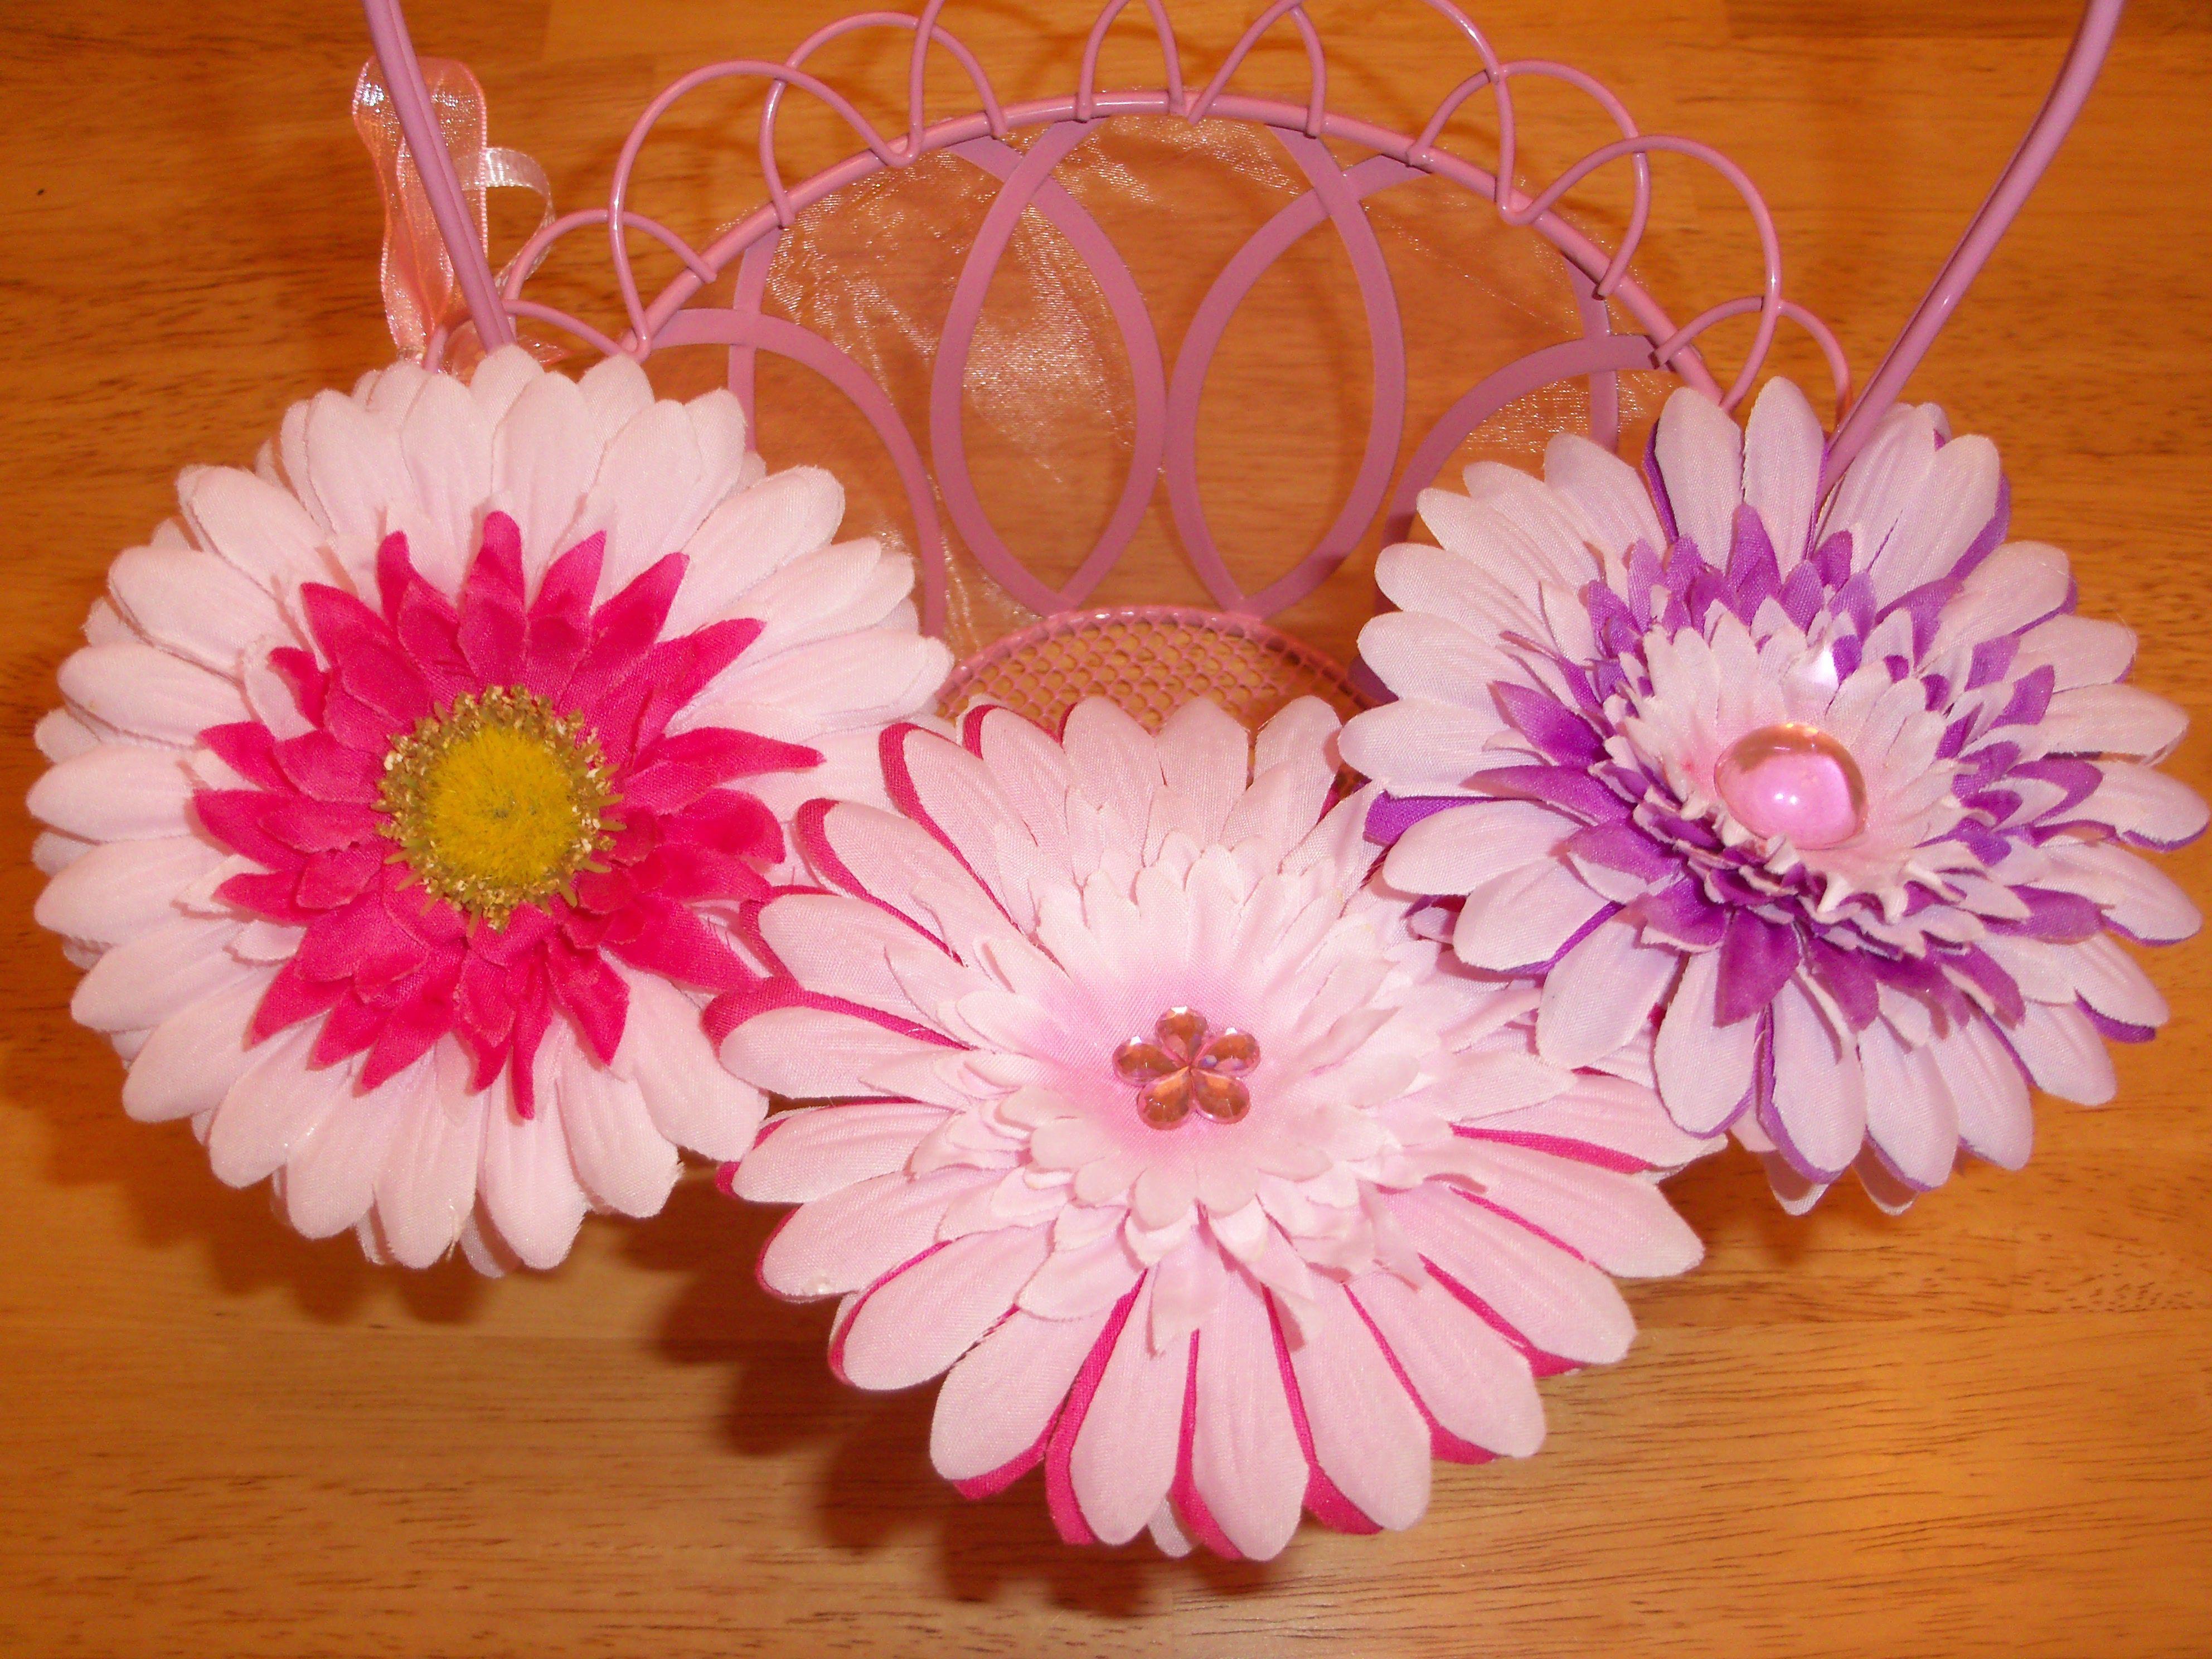 Frugal craft idea how to make beautiful hair flowers for your frugal craft idea how to make beautiful hair flowers for your little girl on the cheap izmirmasajfo